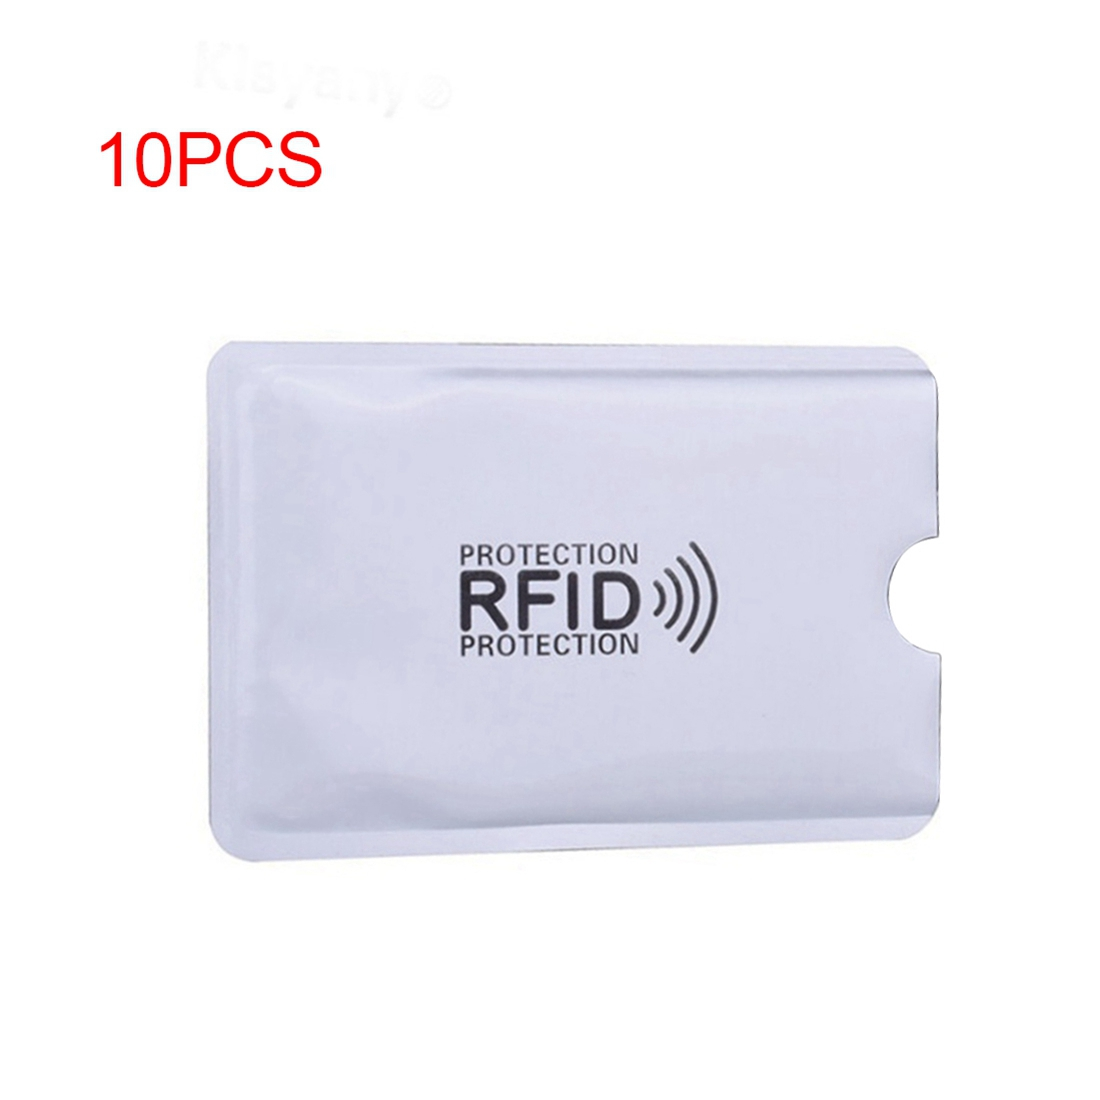 10pcs Aluminum Foil Anti-degaussing Card Cover RFID Shielding Bag NFC Credit Card Anti-theft Brush ID Card Protector